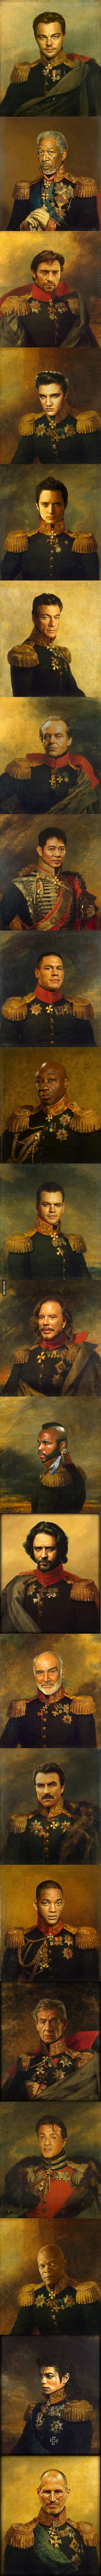 If-Celebrities-Were-19th-Century-Military-Generals